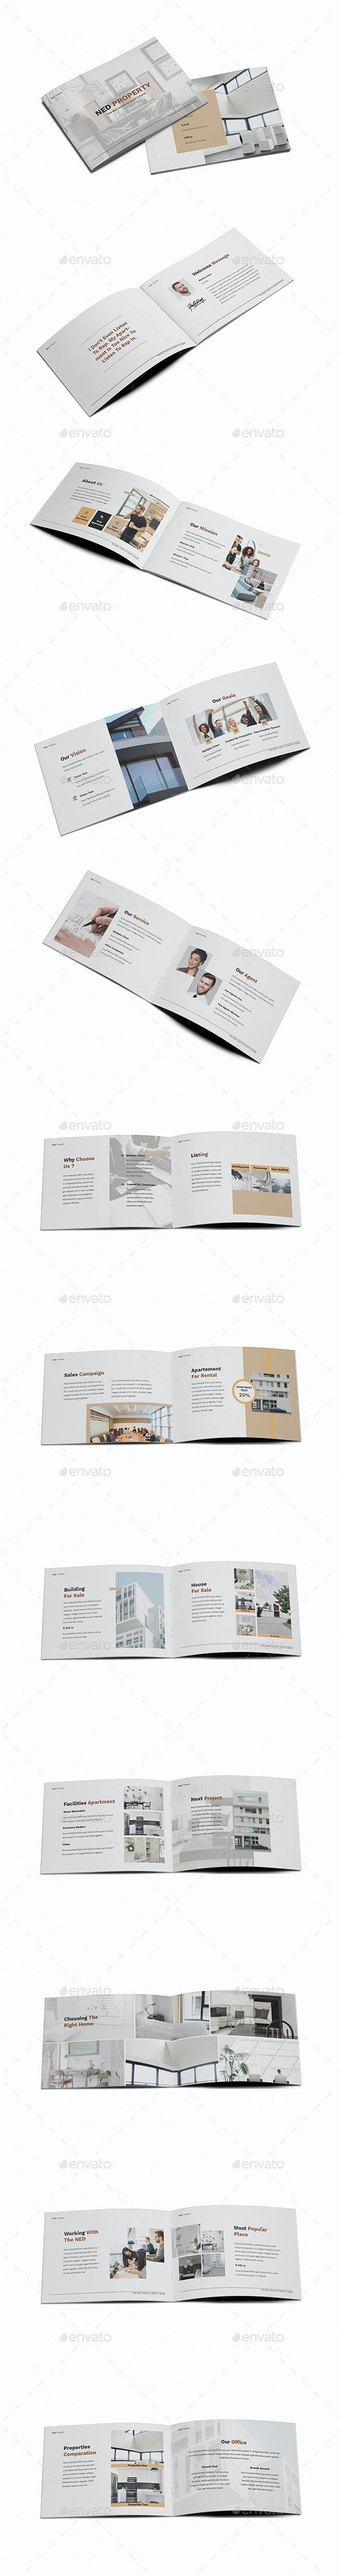 Apartment Property A5 Brochure Template - Brochures Print Templates